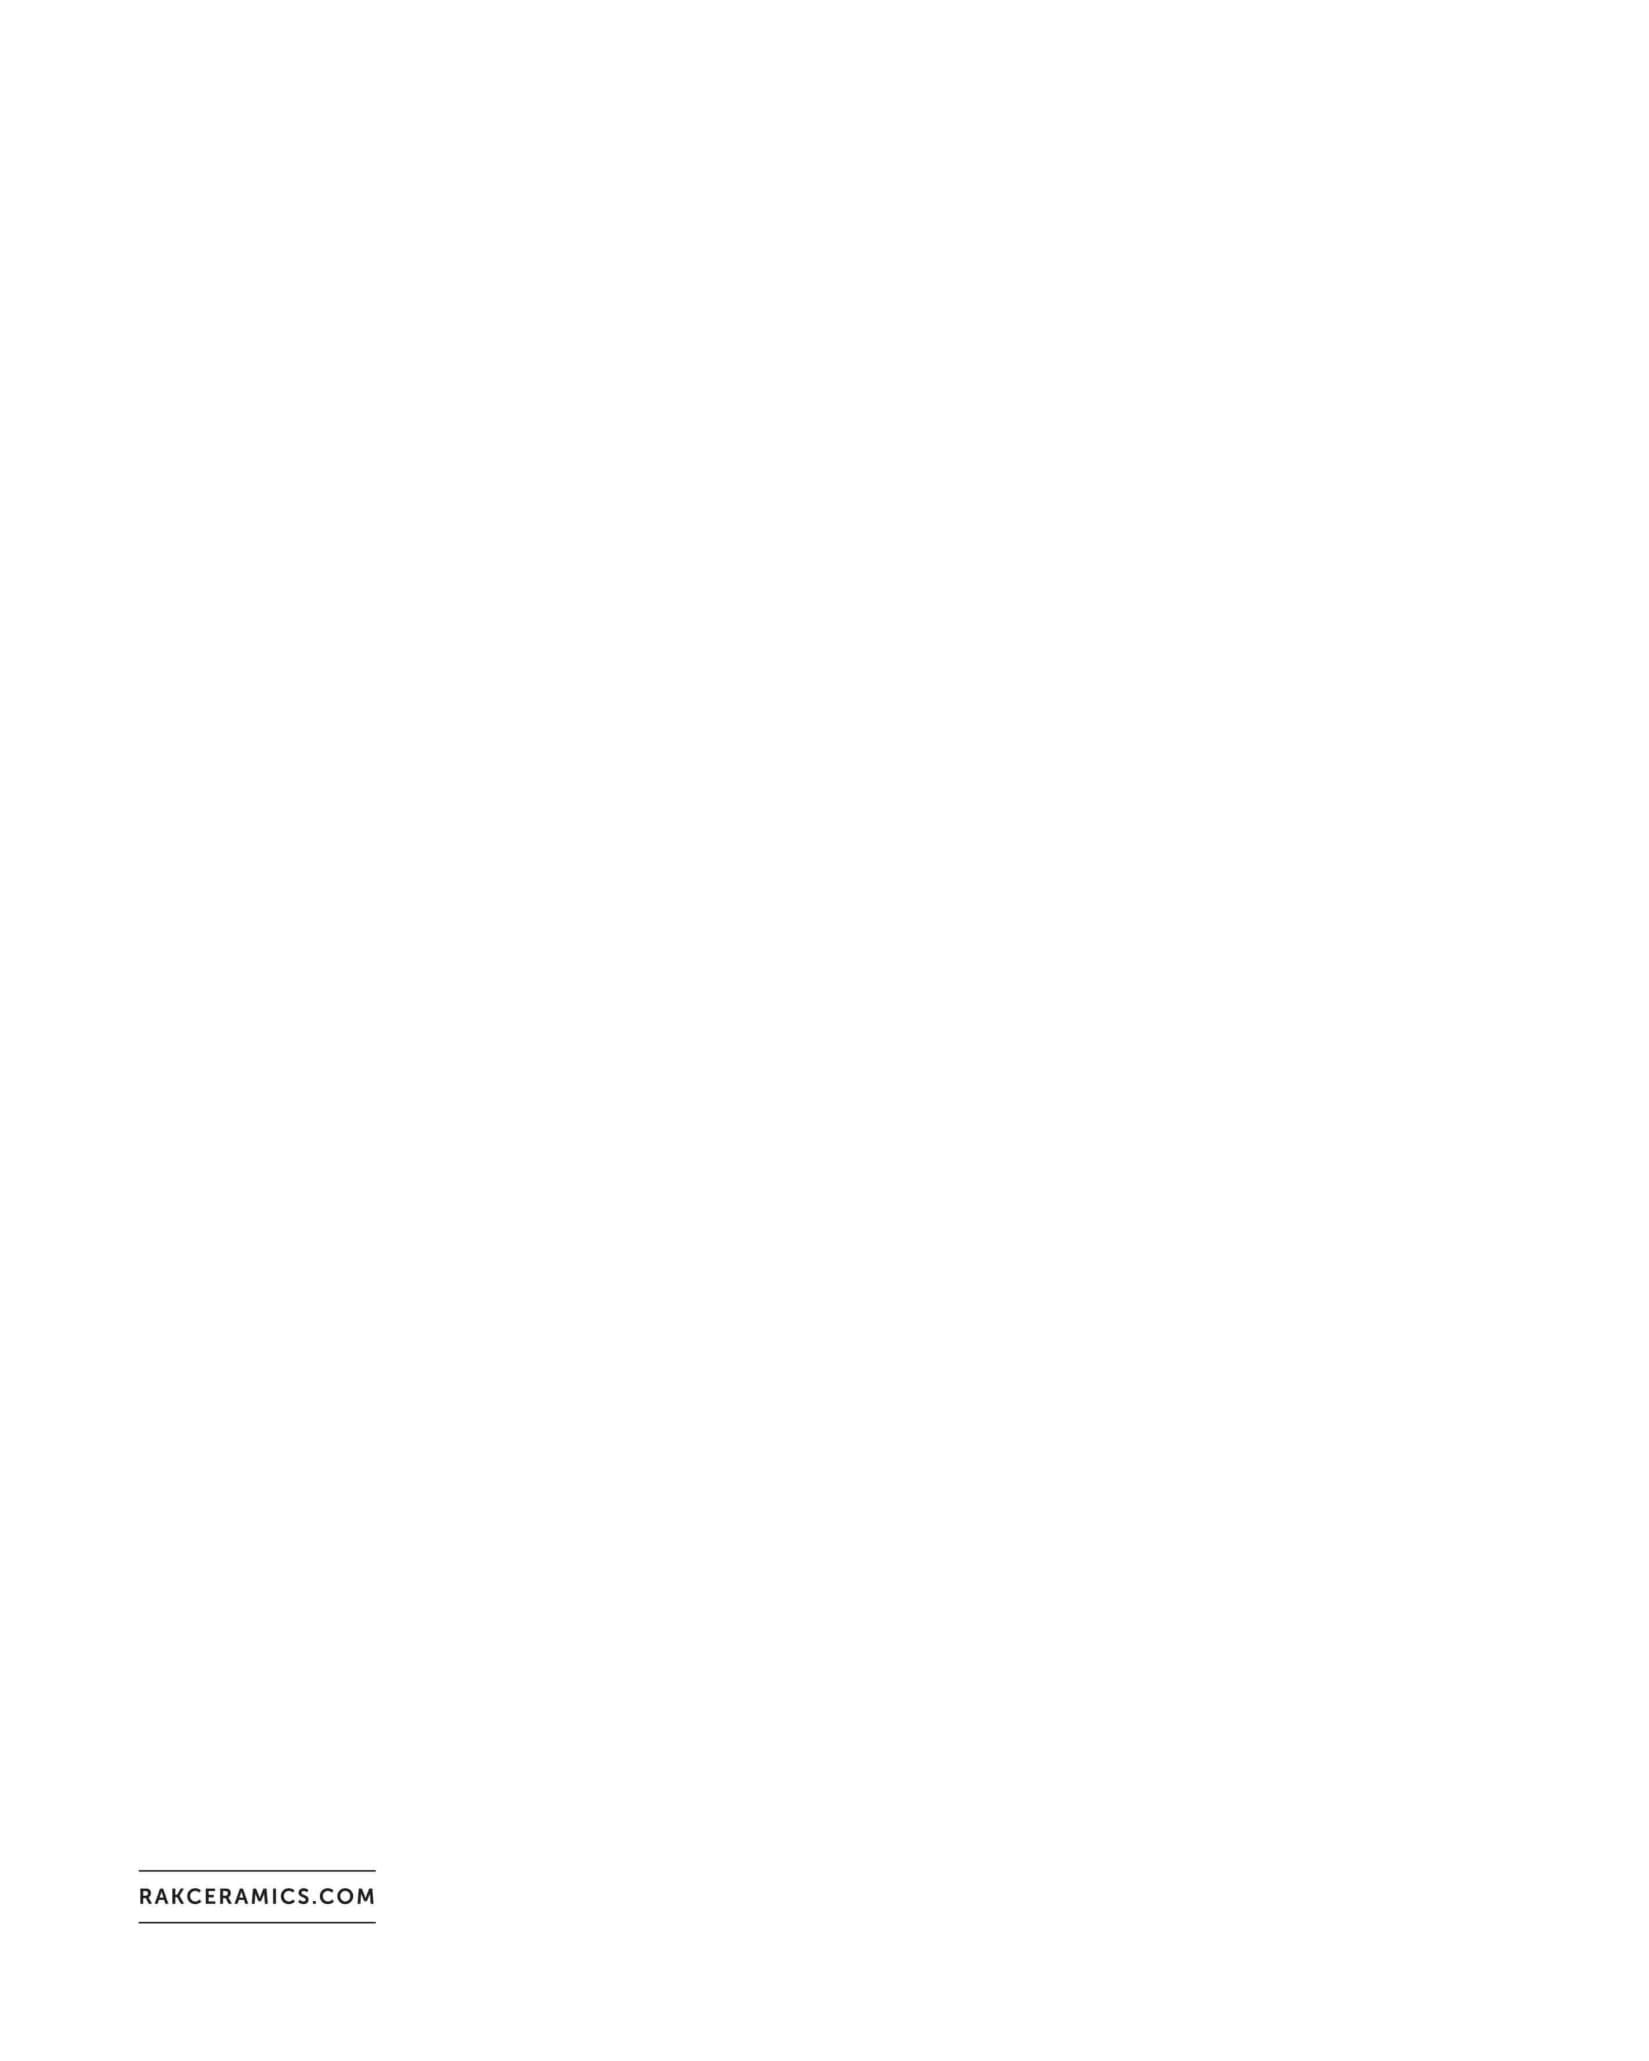 Surface 10 1 - سرامیک طوسی طرح بتن   60در120   پرسلان   سورفیس   طوسی تیره   مات